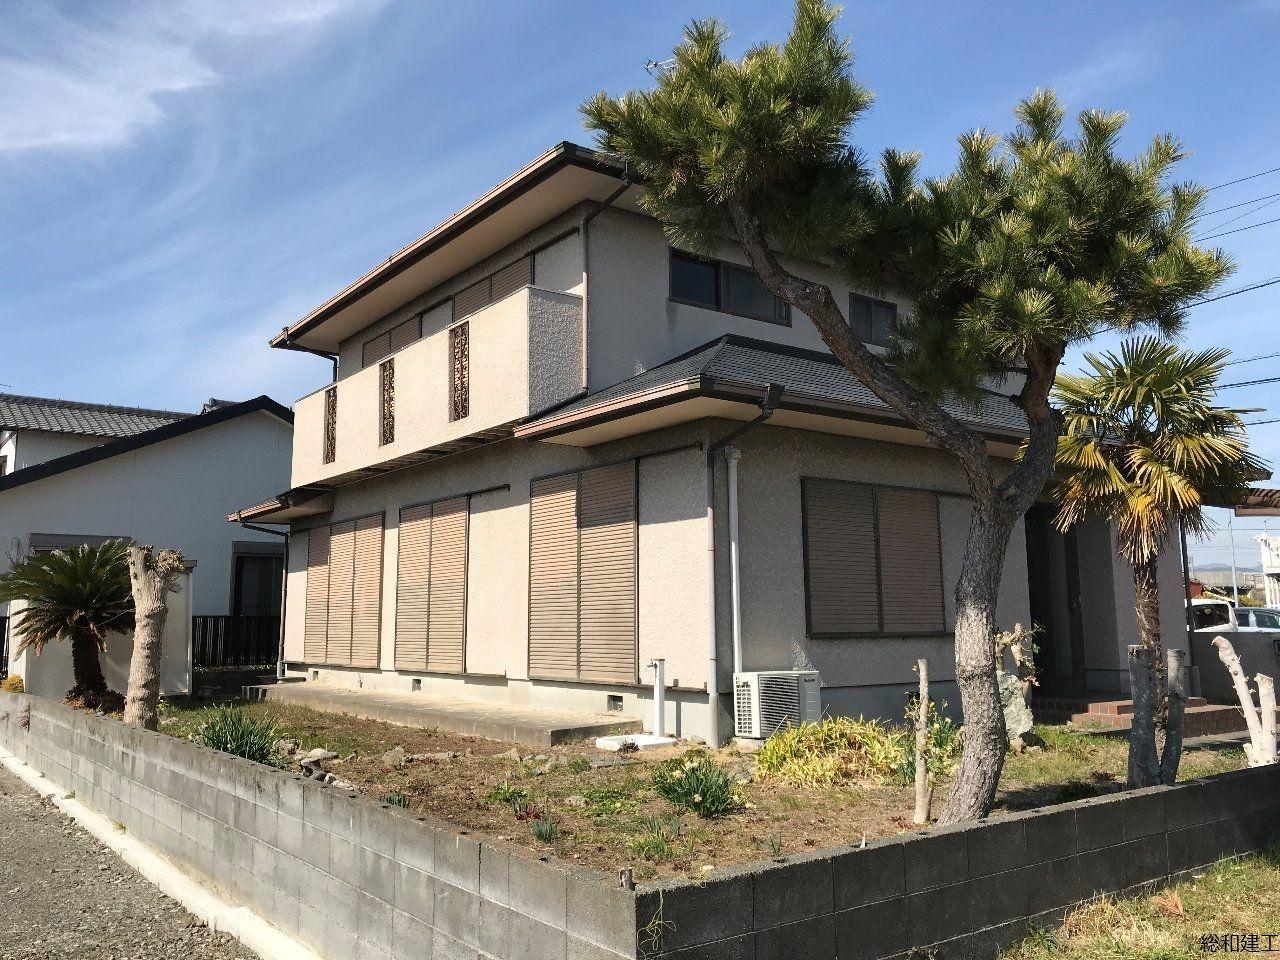 5LDKの大型住宅 広いLDKに続きの和室、床の間もあります。南向きで日当たり良好! 表紙